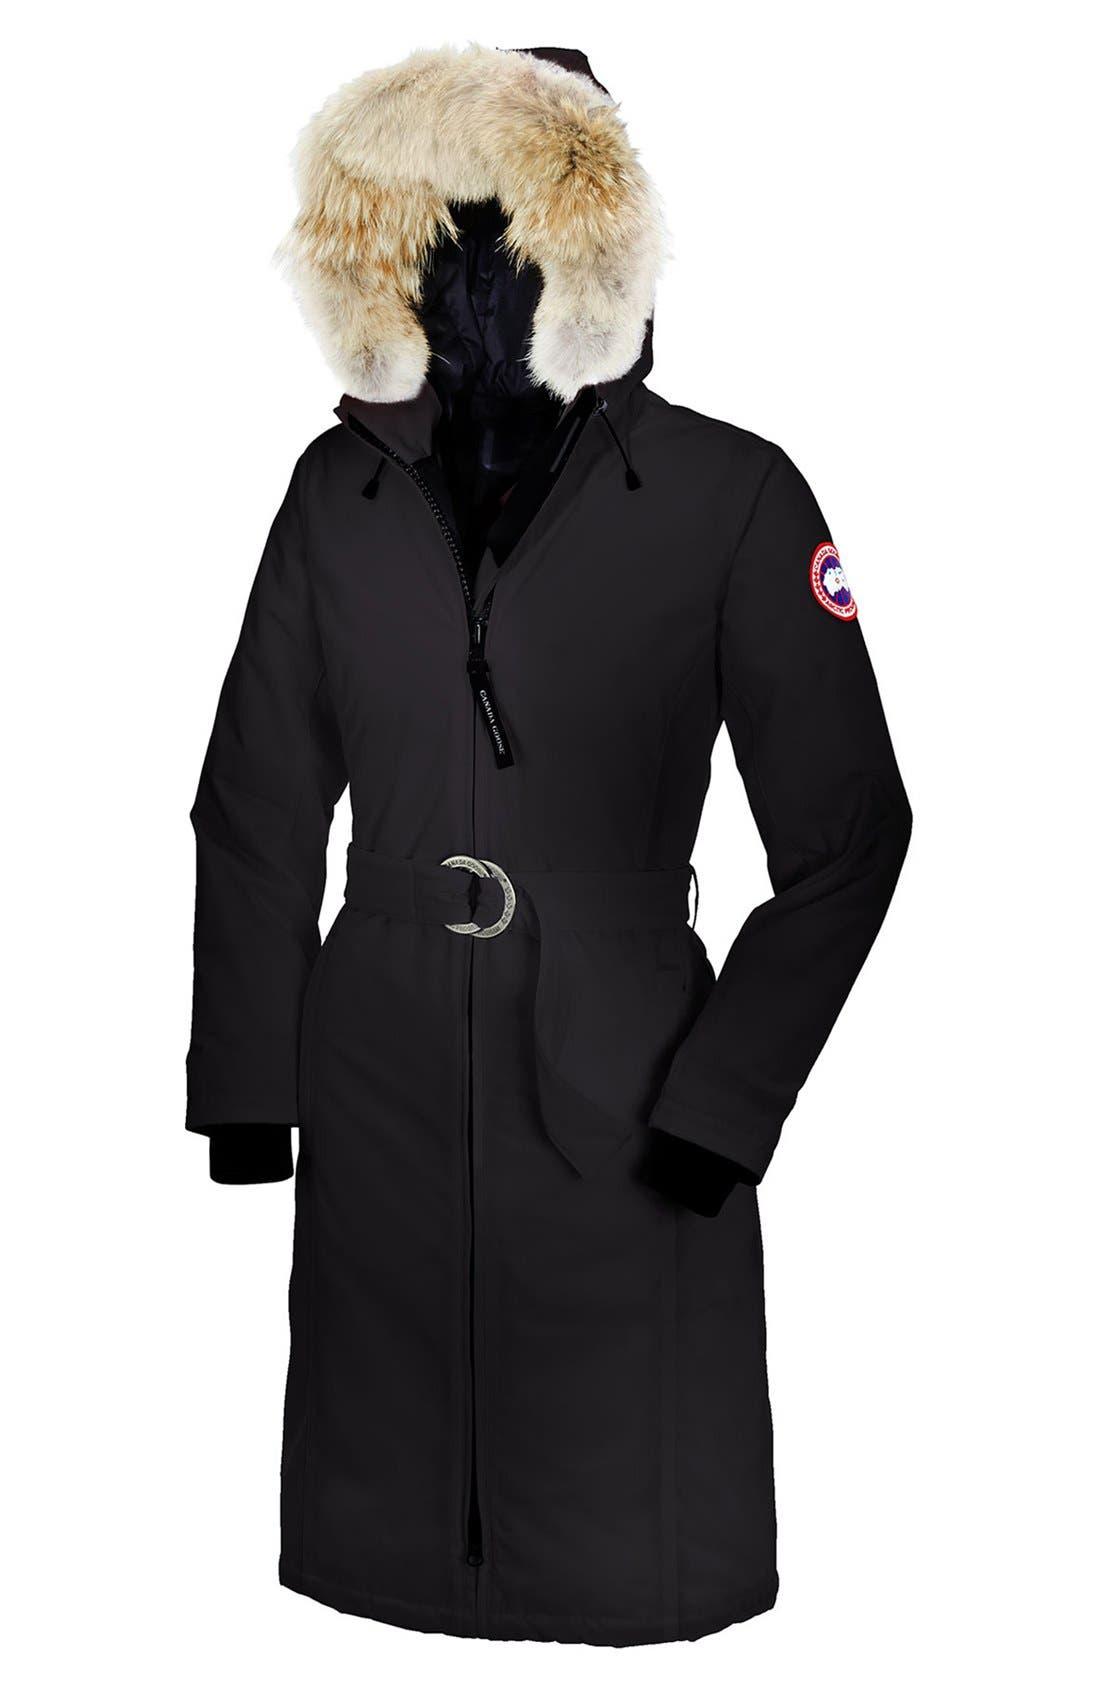 Main Image - Canada Goose 'Whistler' Genuine Coyote Fur Trim Slim Fit Belted Long Down Parka